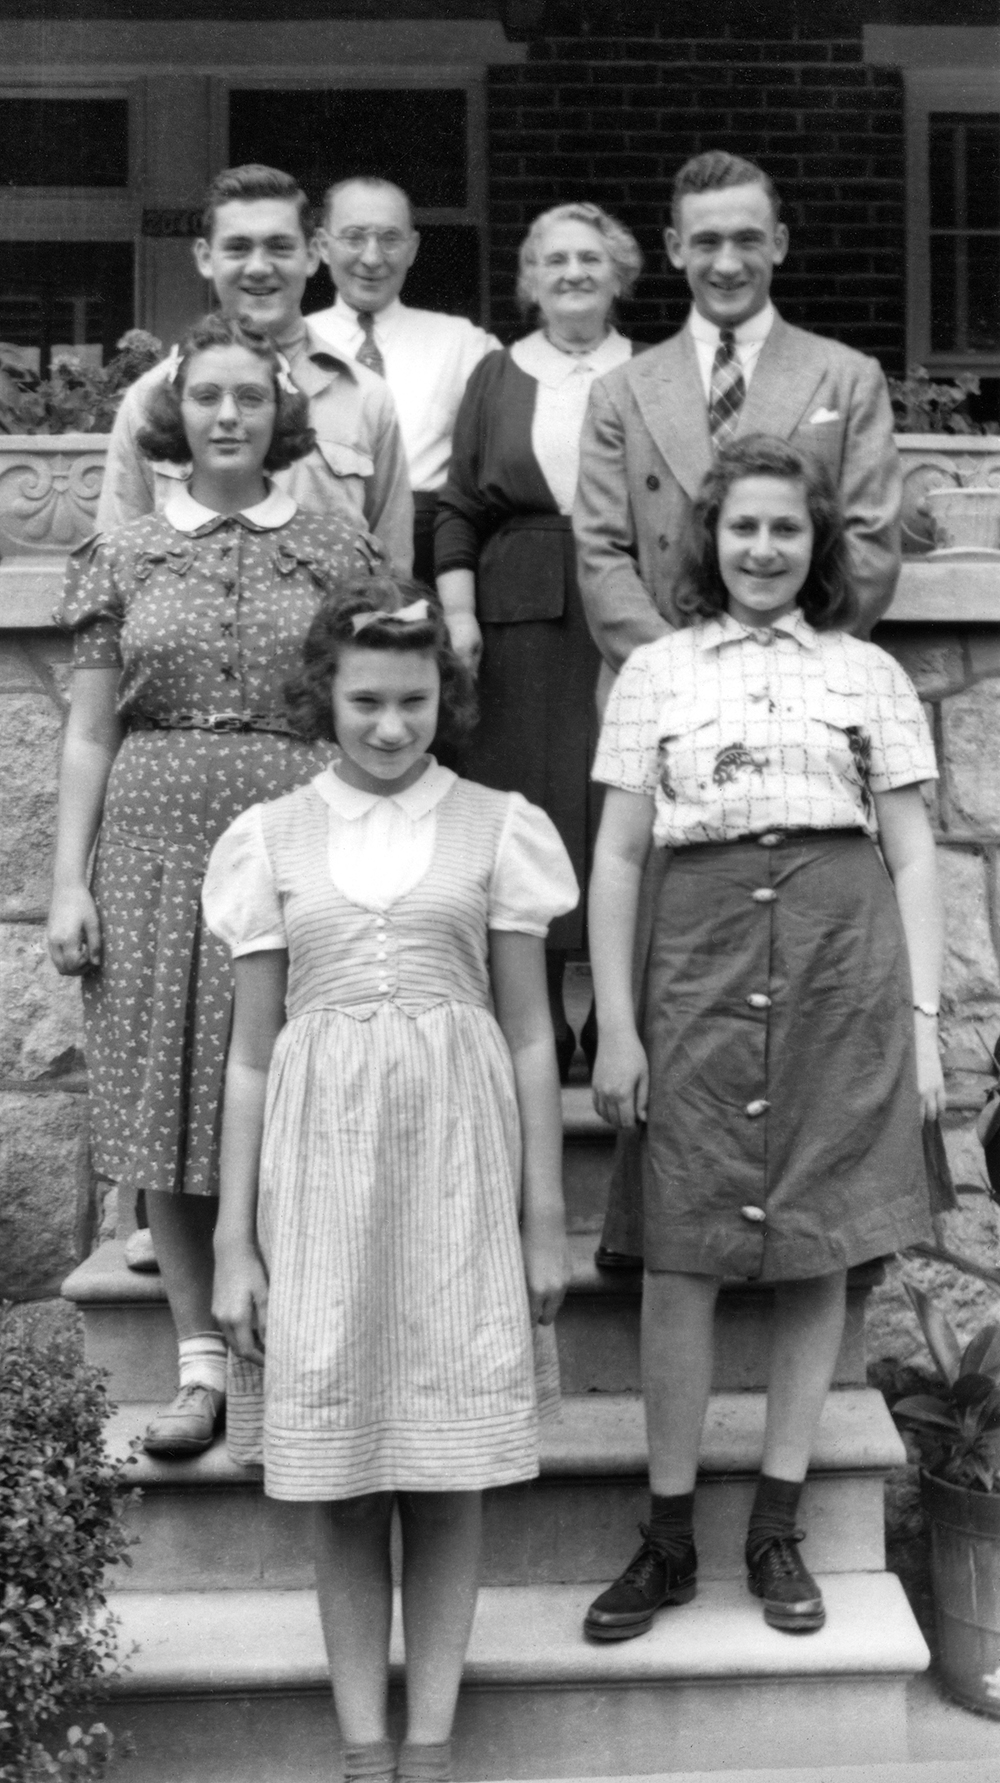 Hyman and Dora Adalman with their grandchildren: Melvin, Bernard, Lillian, Lillian and Anne